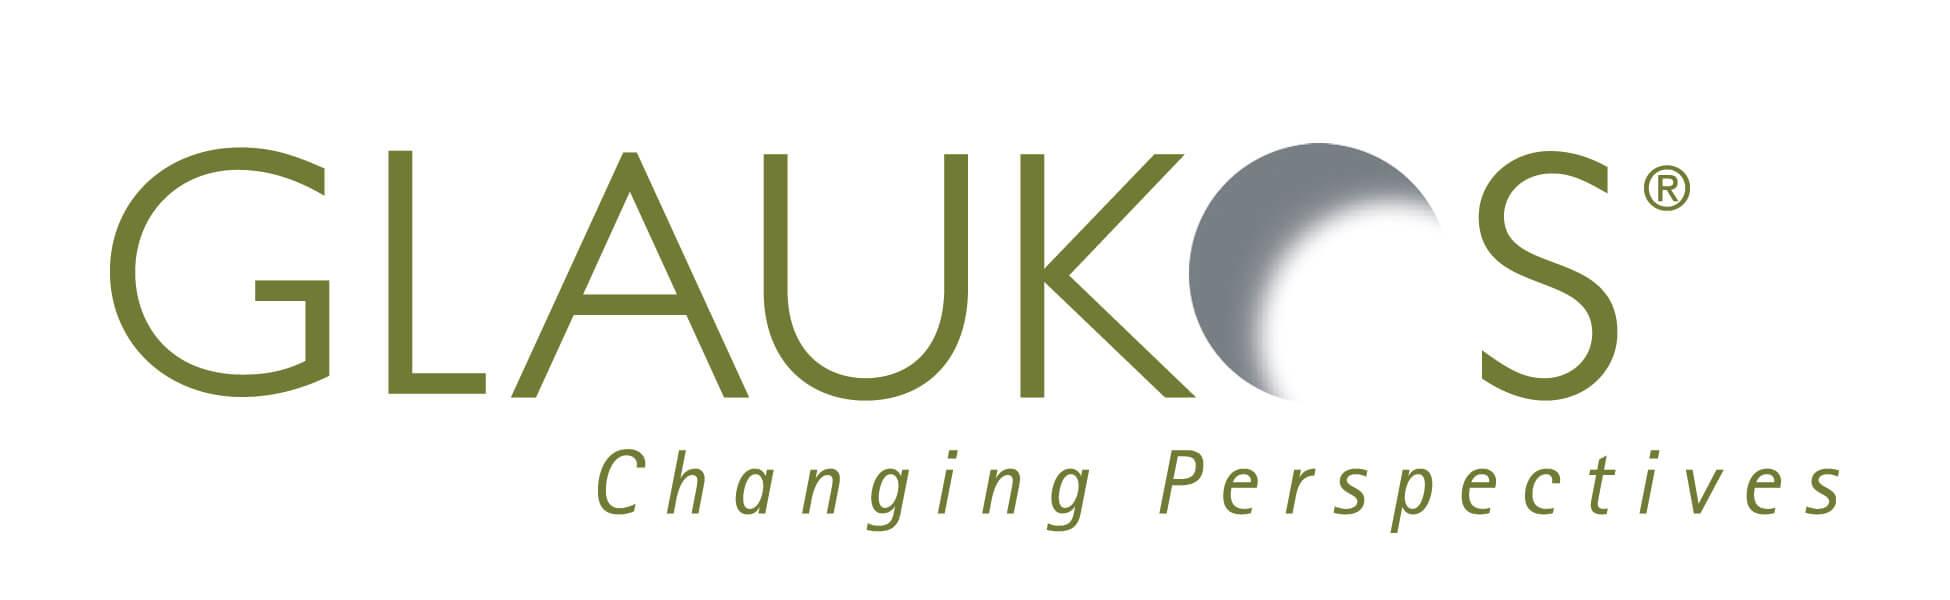 Glaukos Logo with Tag.jpg